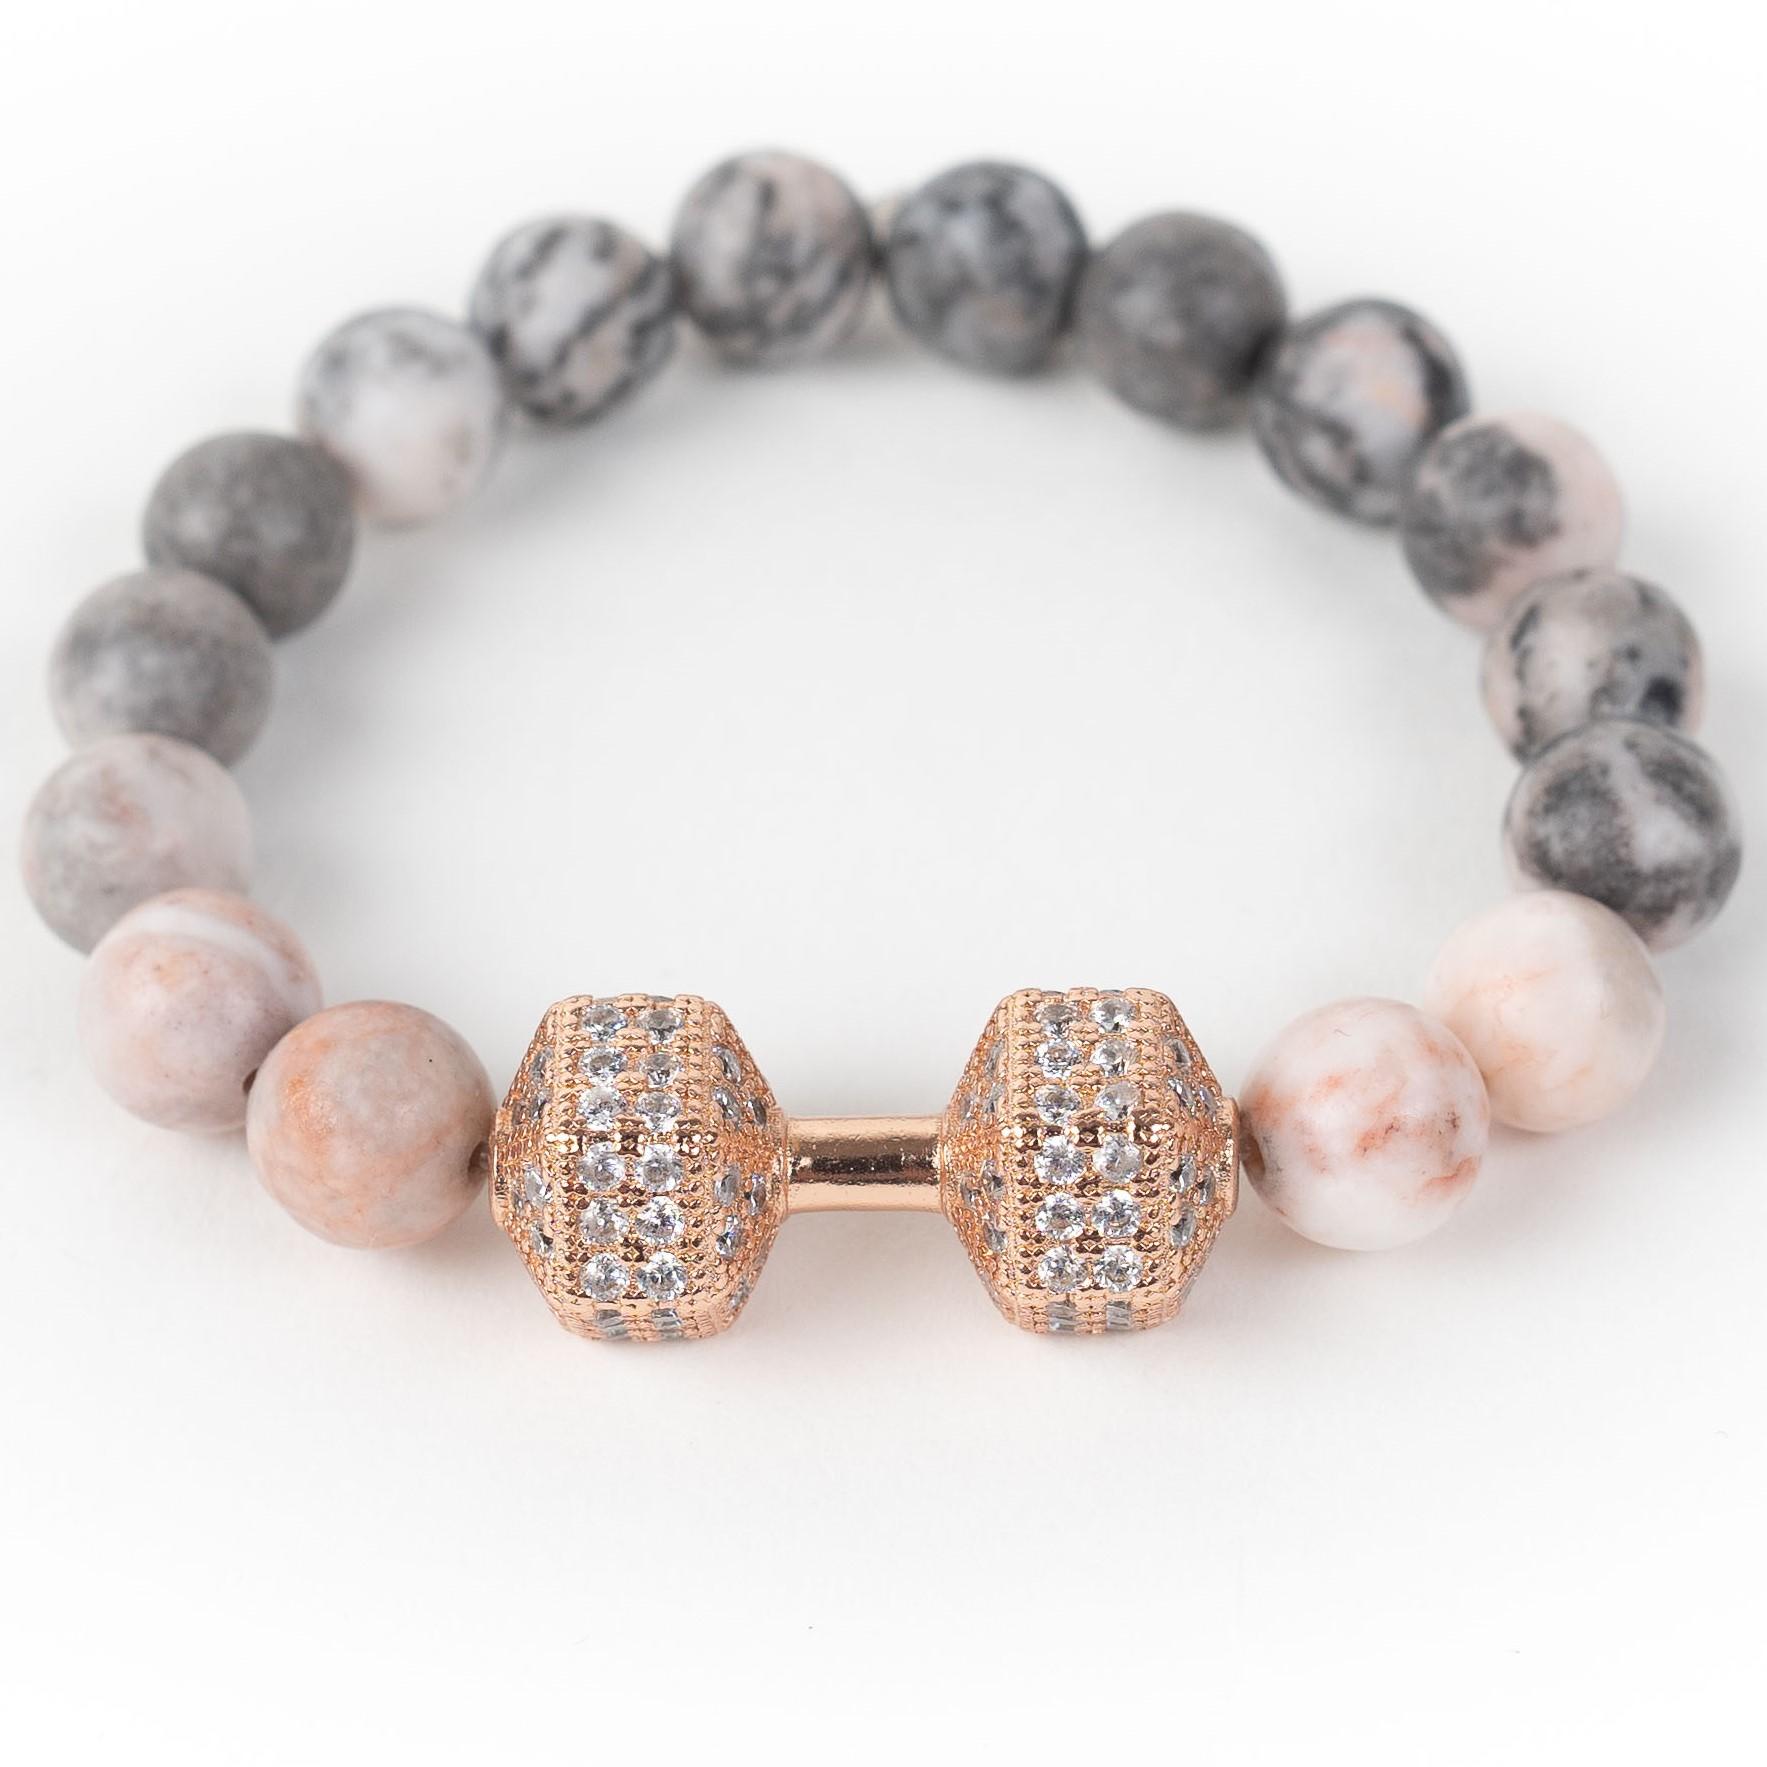 Fitness náramek s krystaly ZEBRA JASPIS Pánský náramek, Růžová činka